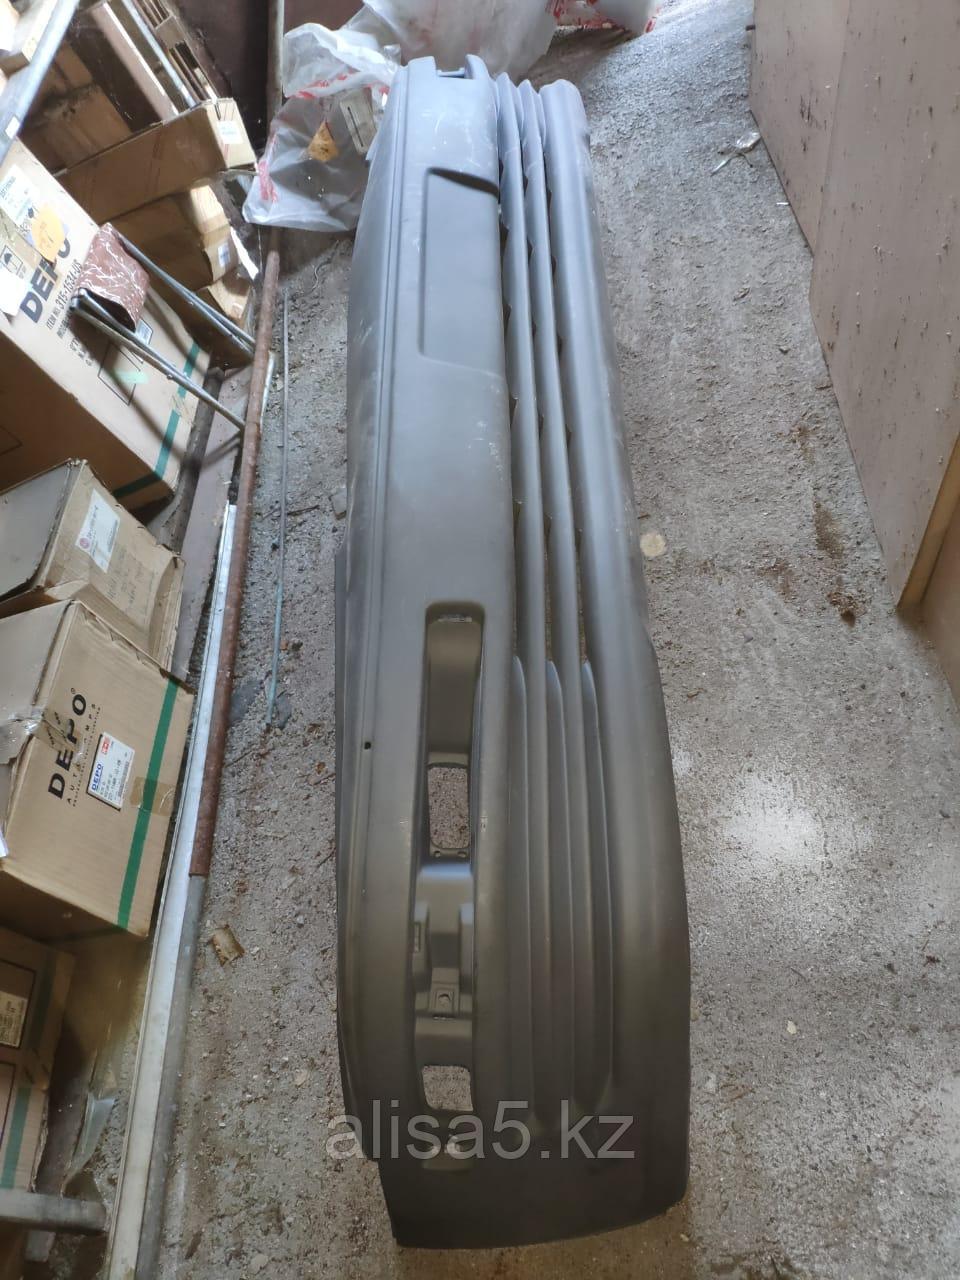 LEXUS LS400 1990-1994 гг. Передний бампер. Front Bumper primed w/o f.l.holes (52119-50907)